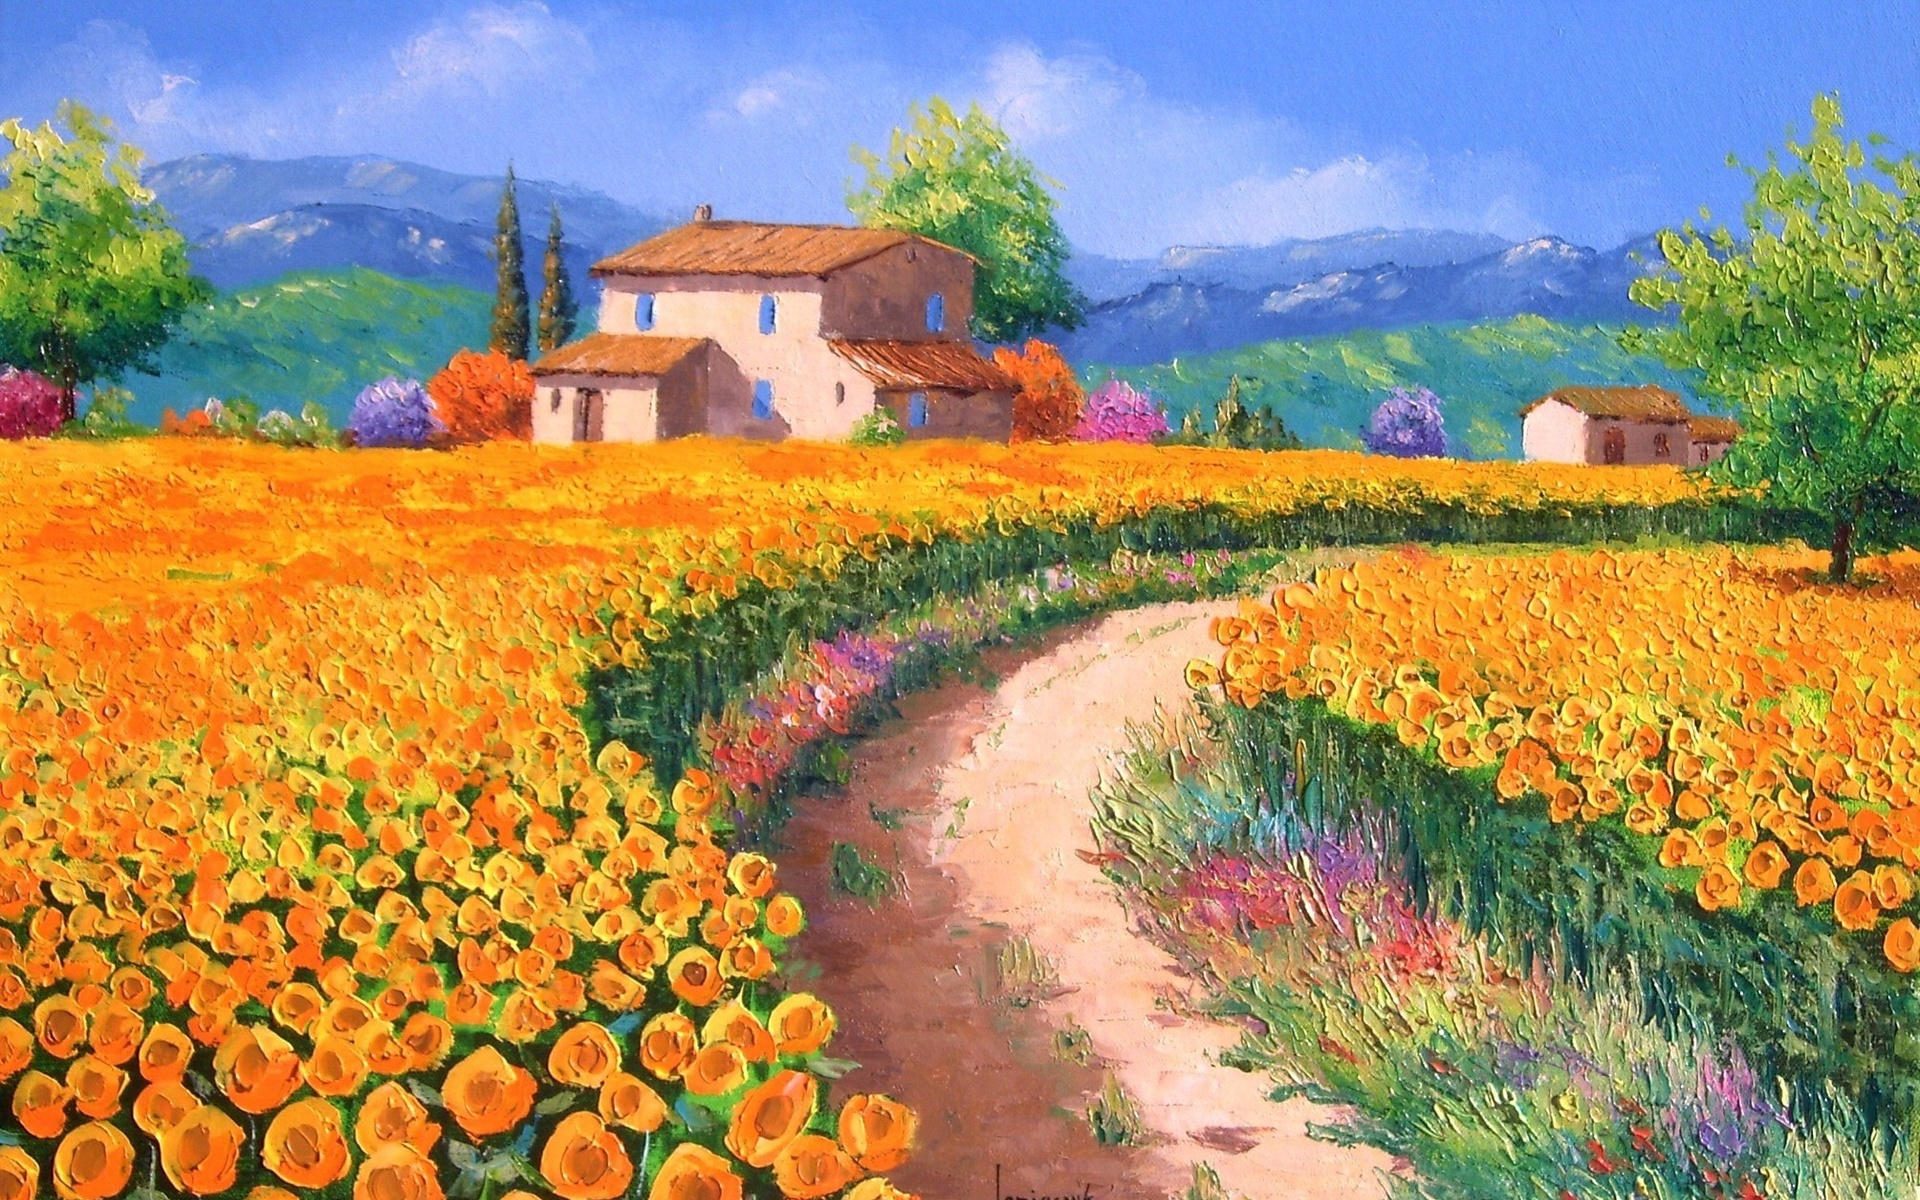 картина, пейзаж, арт, jean-marc janiaczyk, домики, поле, дорога, цветы, подсолнухи, деревья, горы, холмы